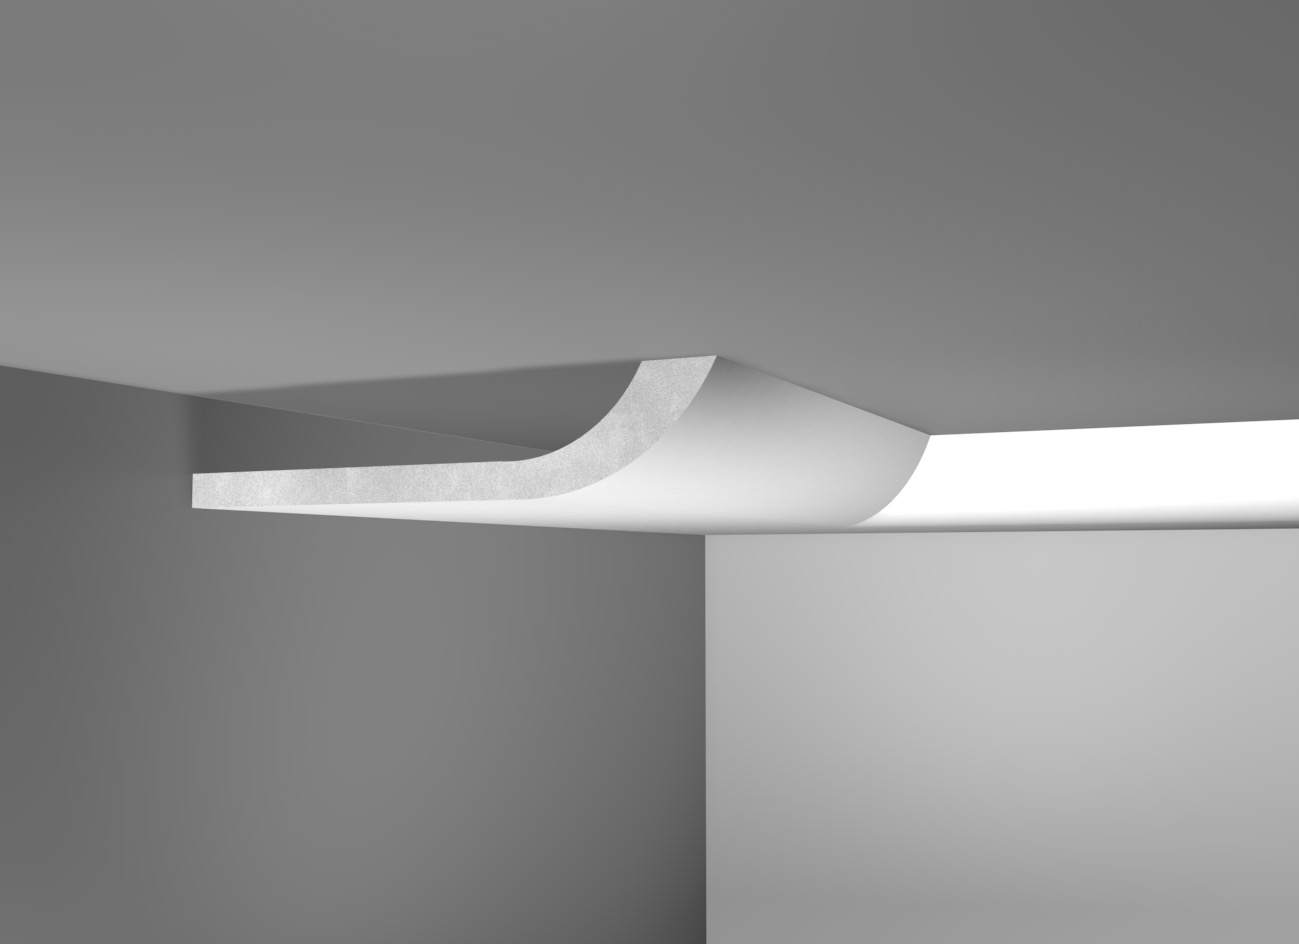 Lux 50 - Cornice in polistirene gessato bianco - Decorget - Ital Decori - Image 0